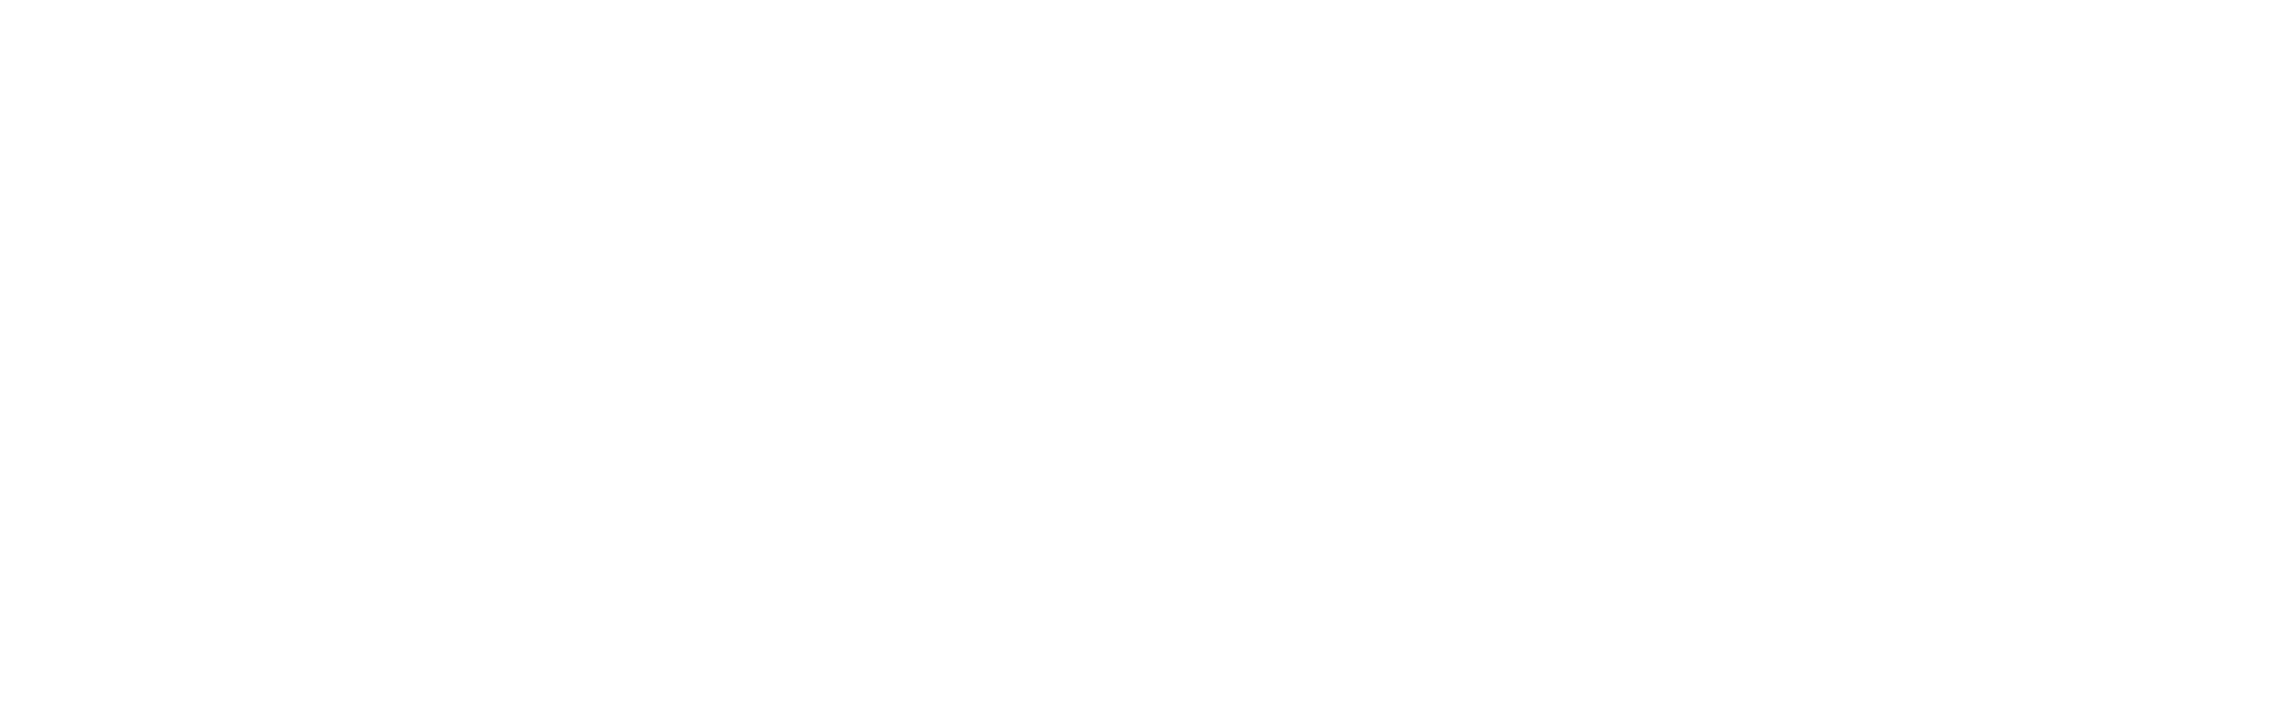 Eunic logo